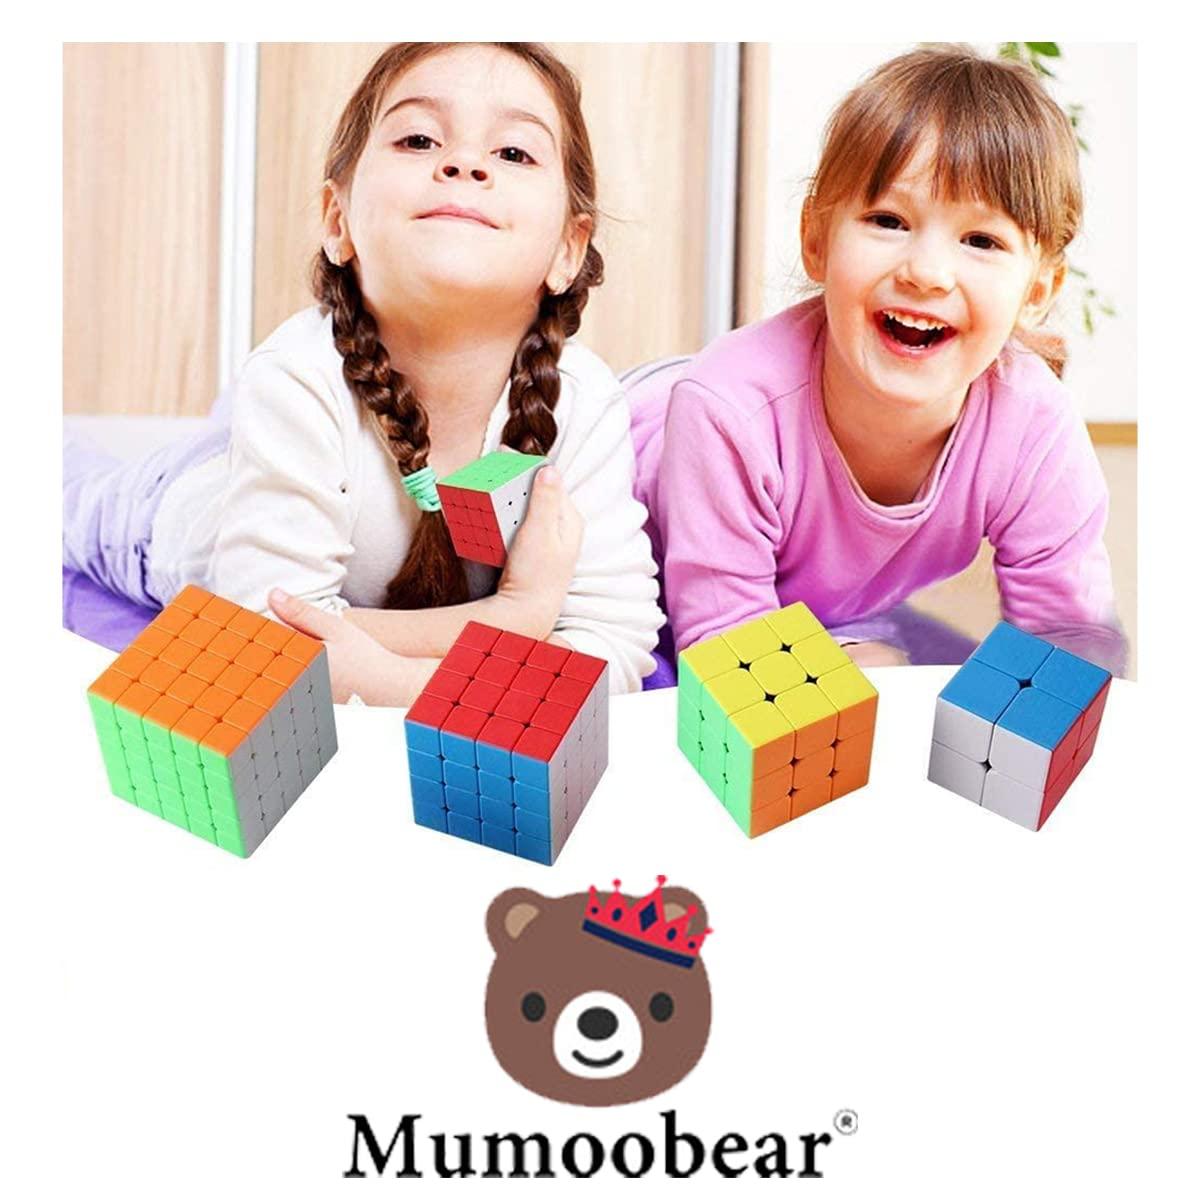 Mummoo bear